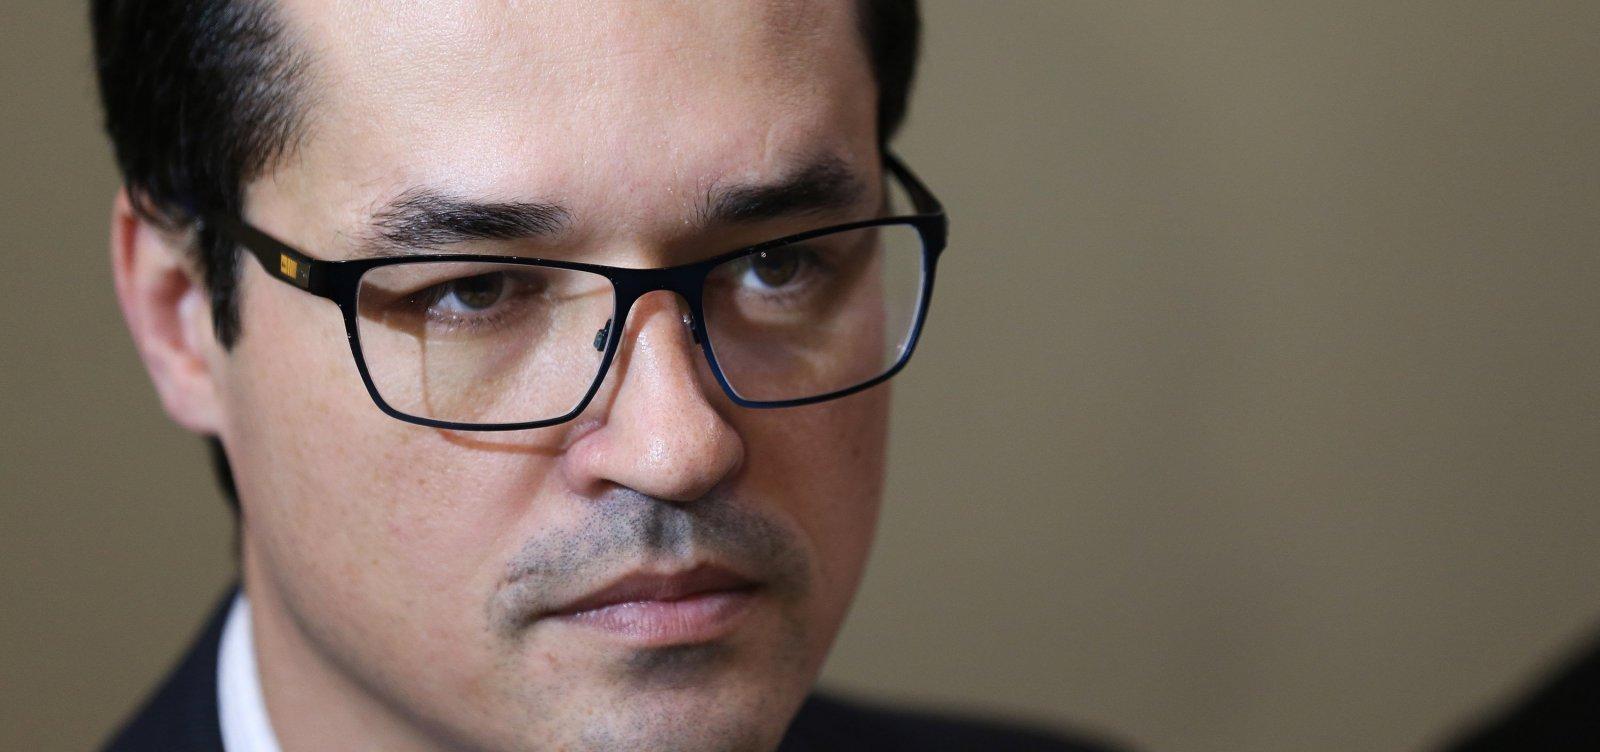 Fux destrava processo disciplinar contra Deltan no Conselho do MP